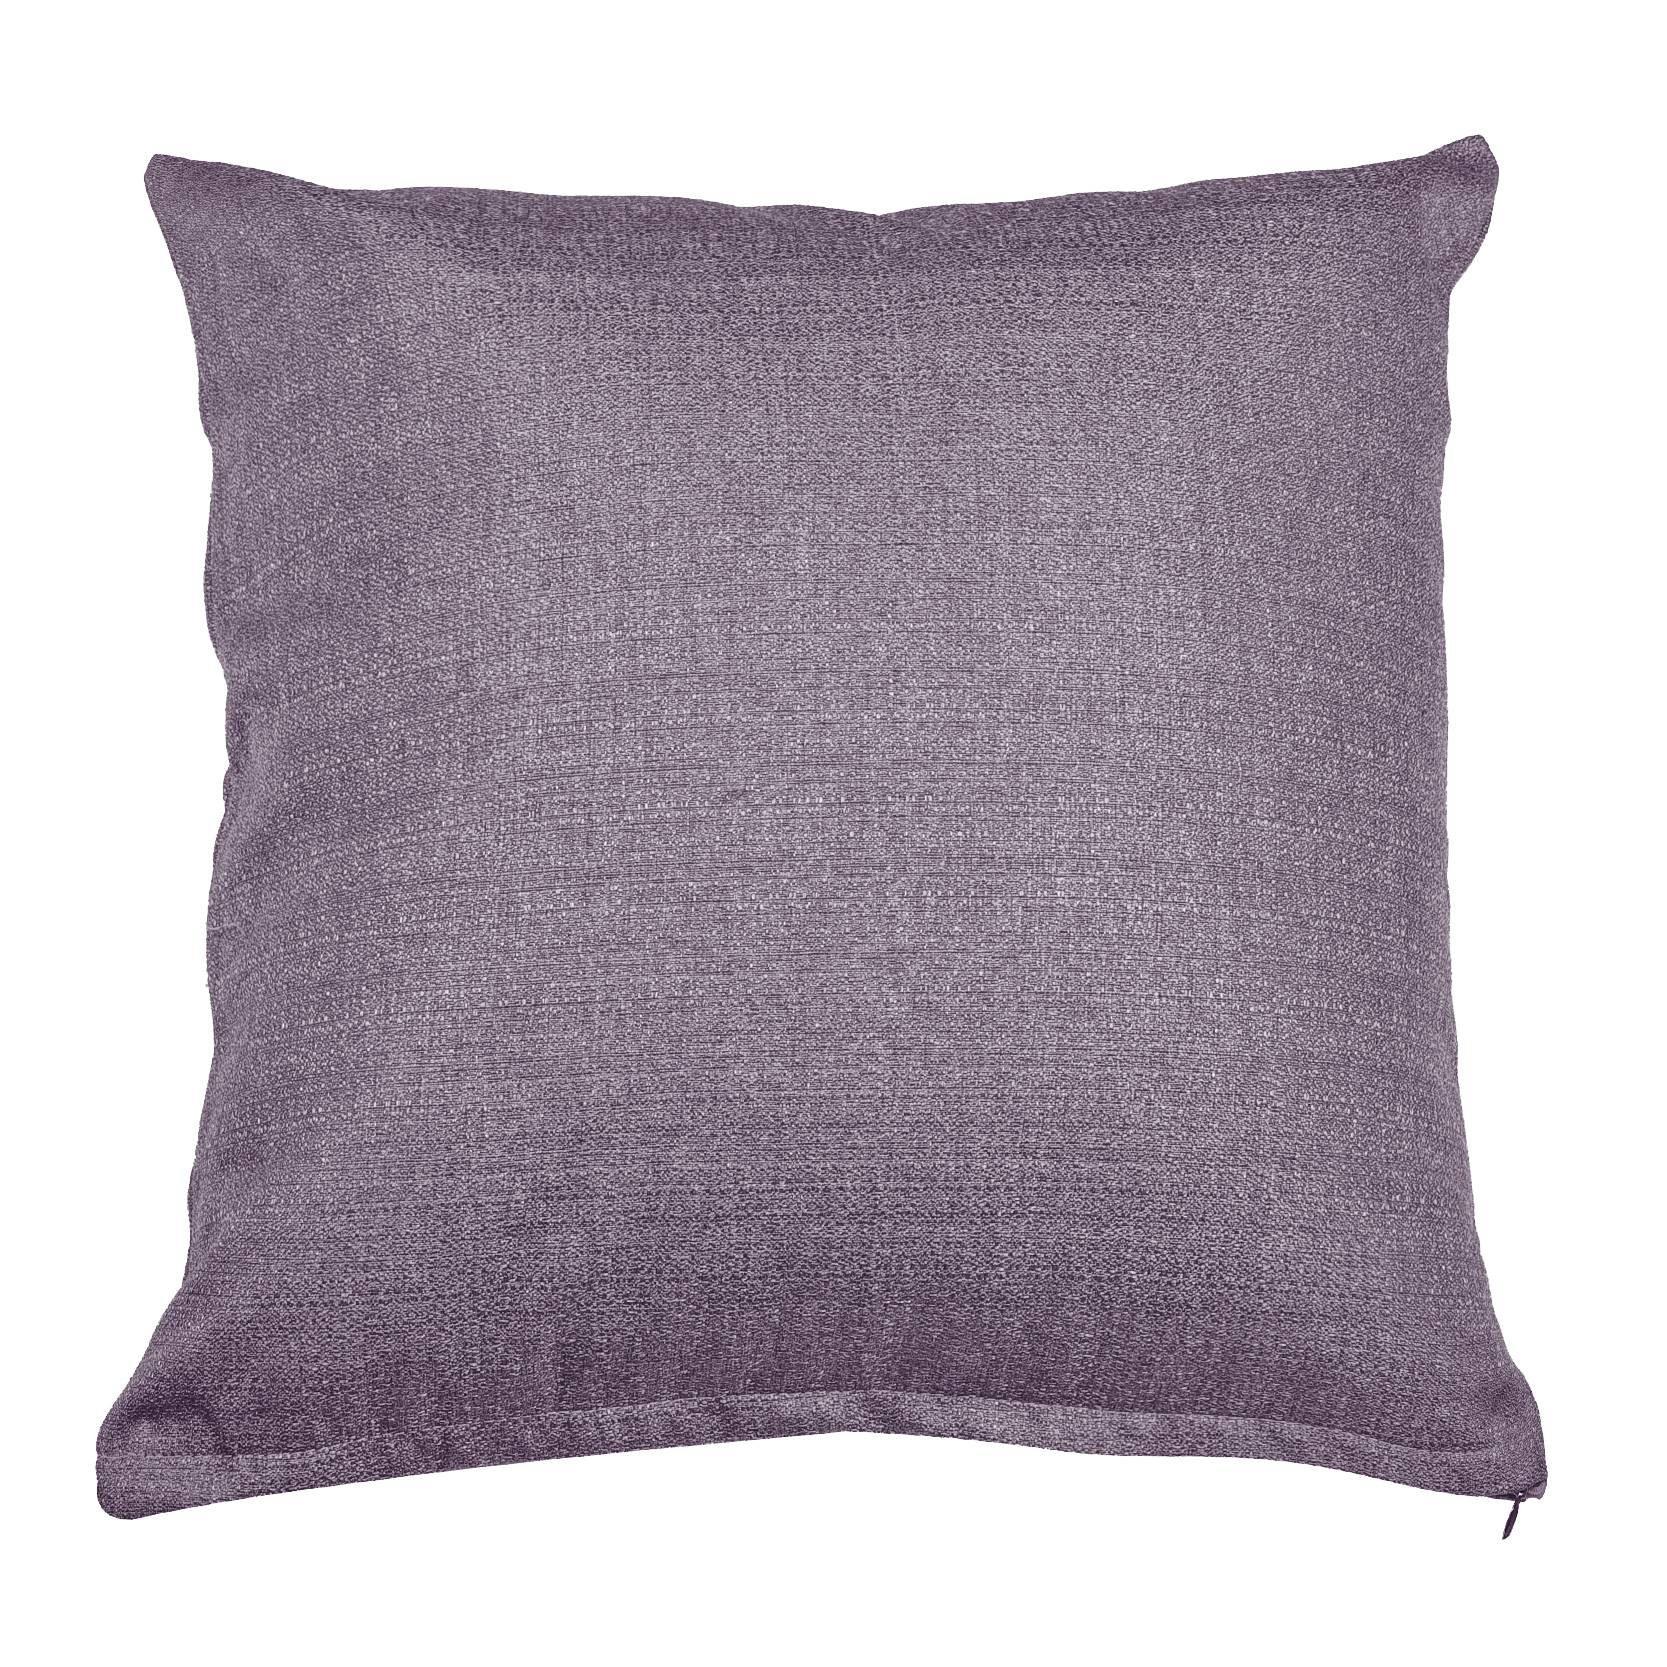 MAYUAN520 Cushion、Decorative Pillows 4545Cm Simple Pure Color Cuhsion Cover Decorative Pure Color Pillow Case For Sofa Bed Chair Car Seats Home Decoration,3